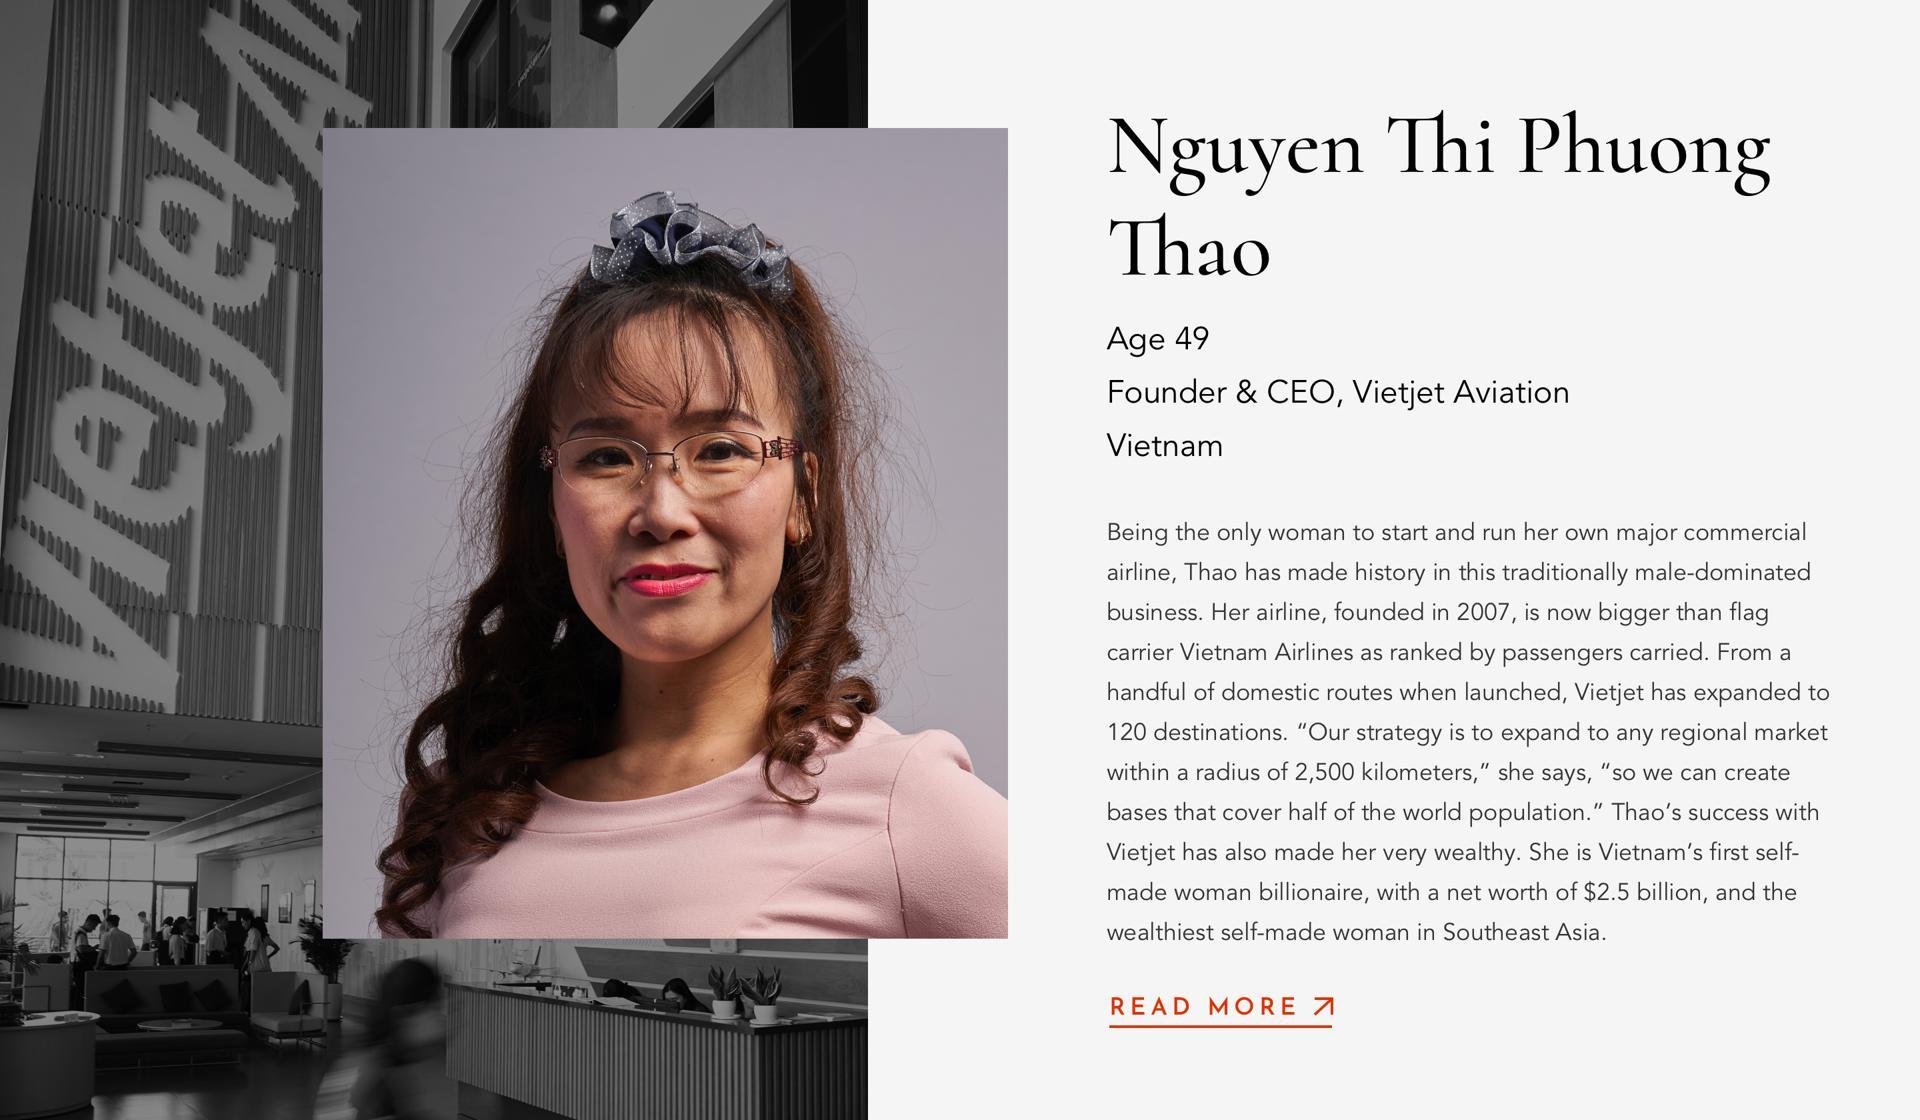 ThaoNguyen Thi PhuongFounder & CEOVietjet Aviation49Vietnam